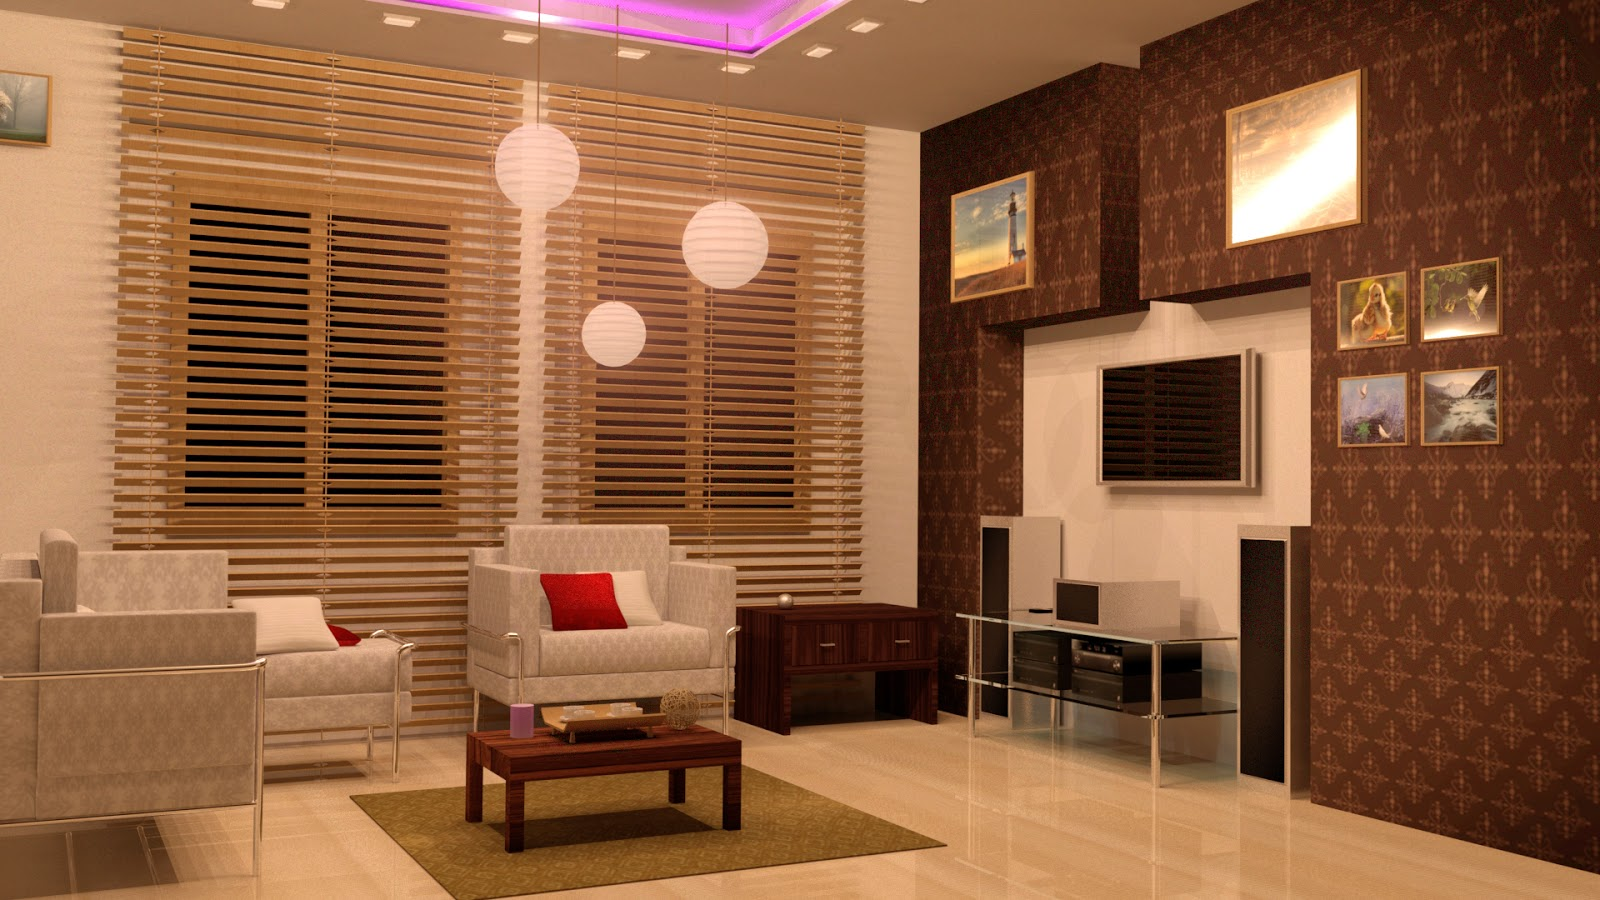 Althaf Khan Designs 3D Interior Design